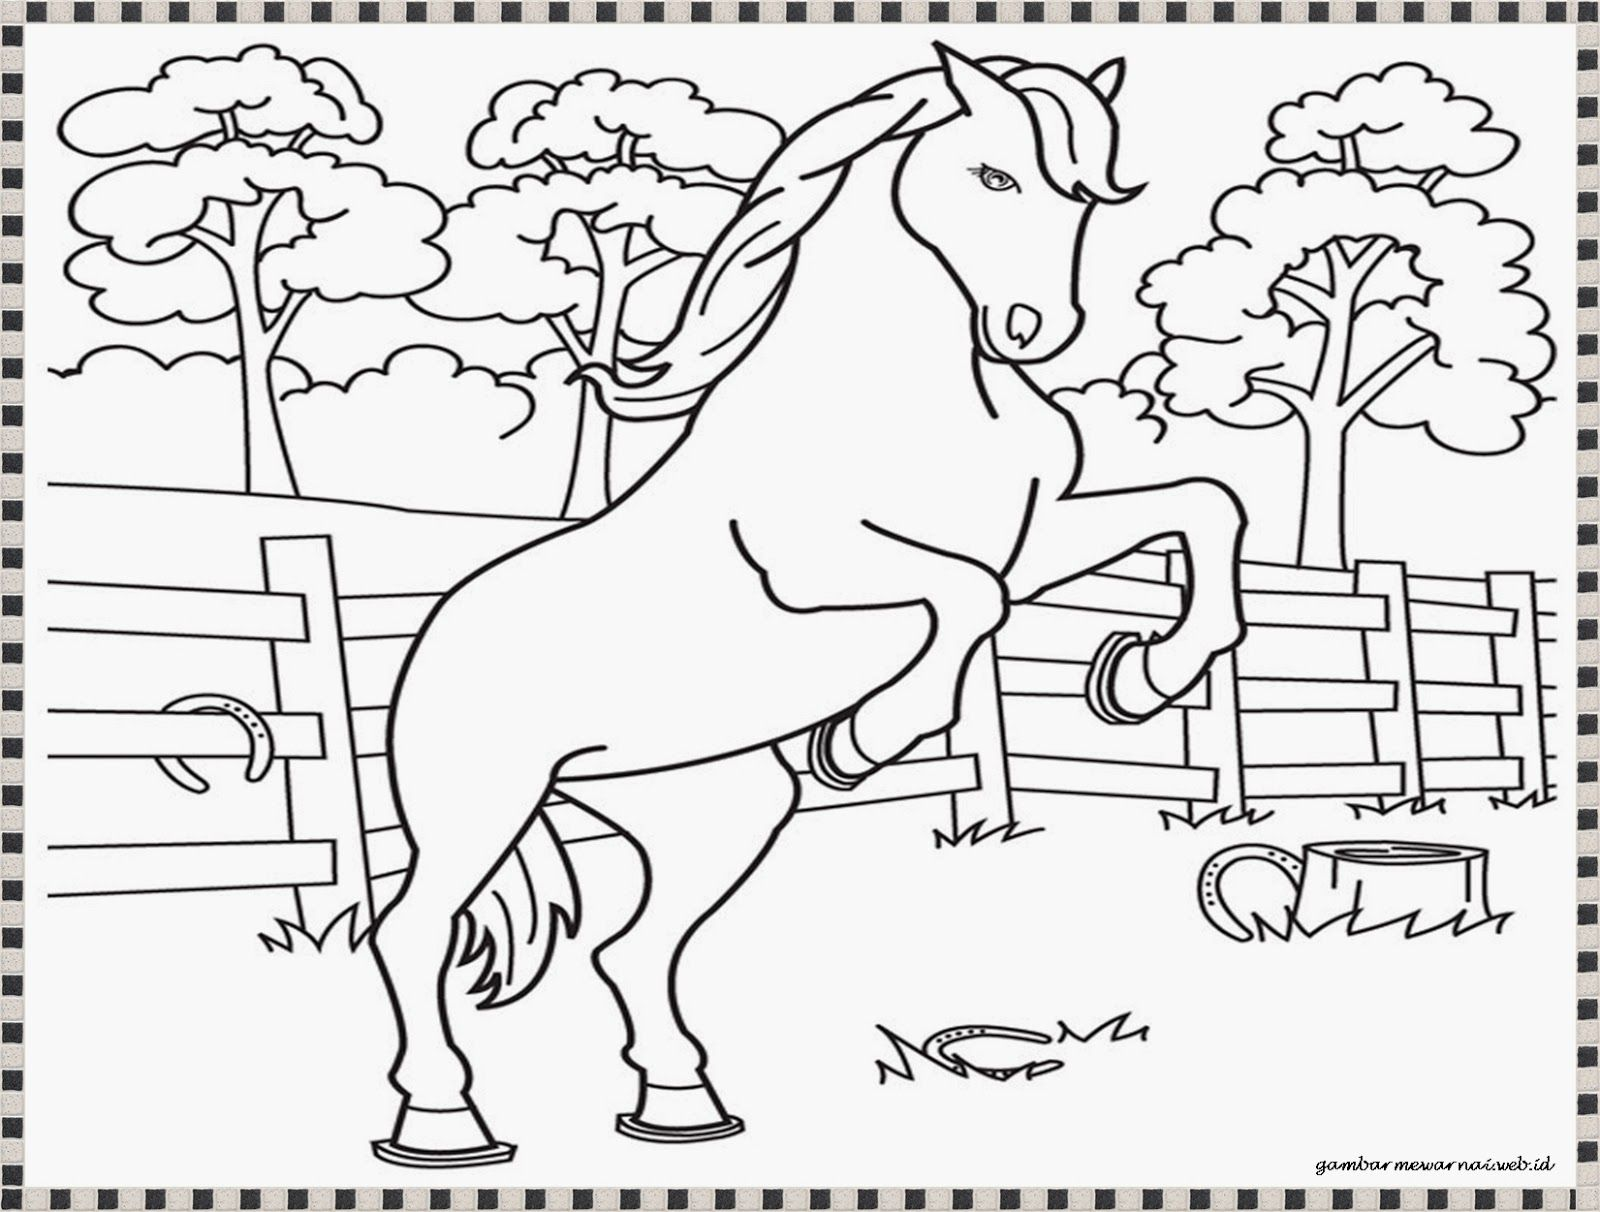 gambar mewarnai kuda